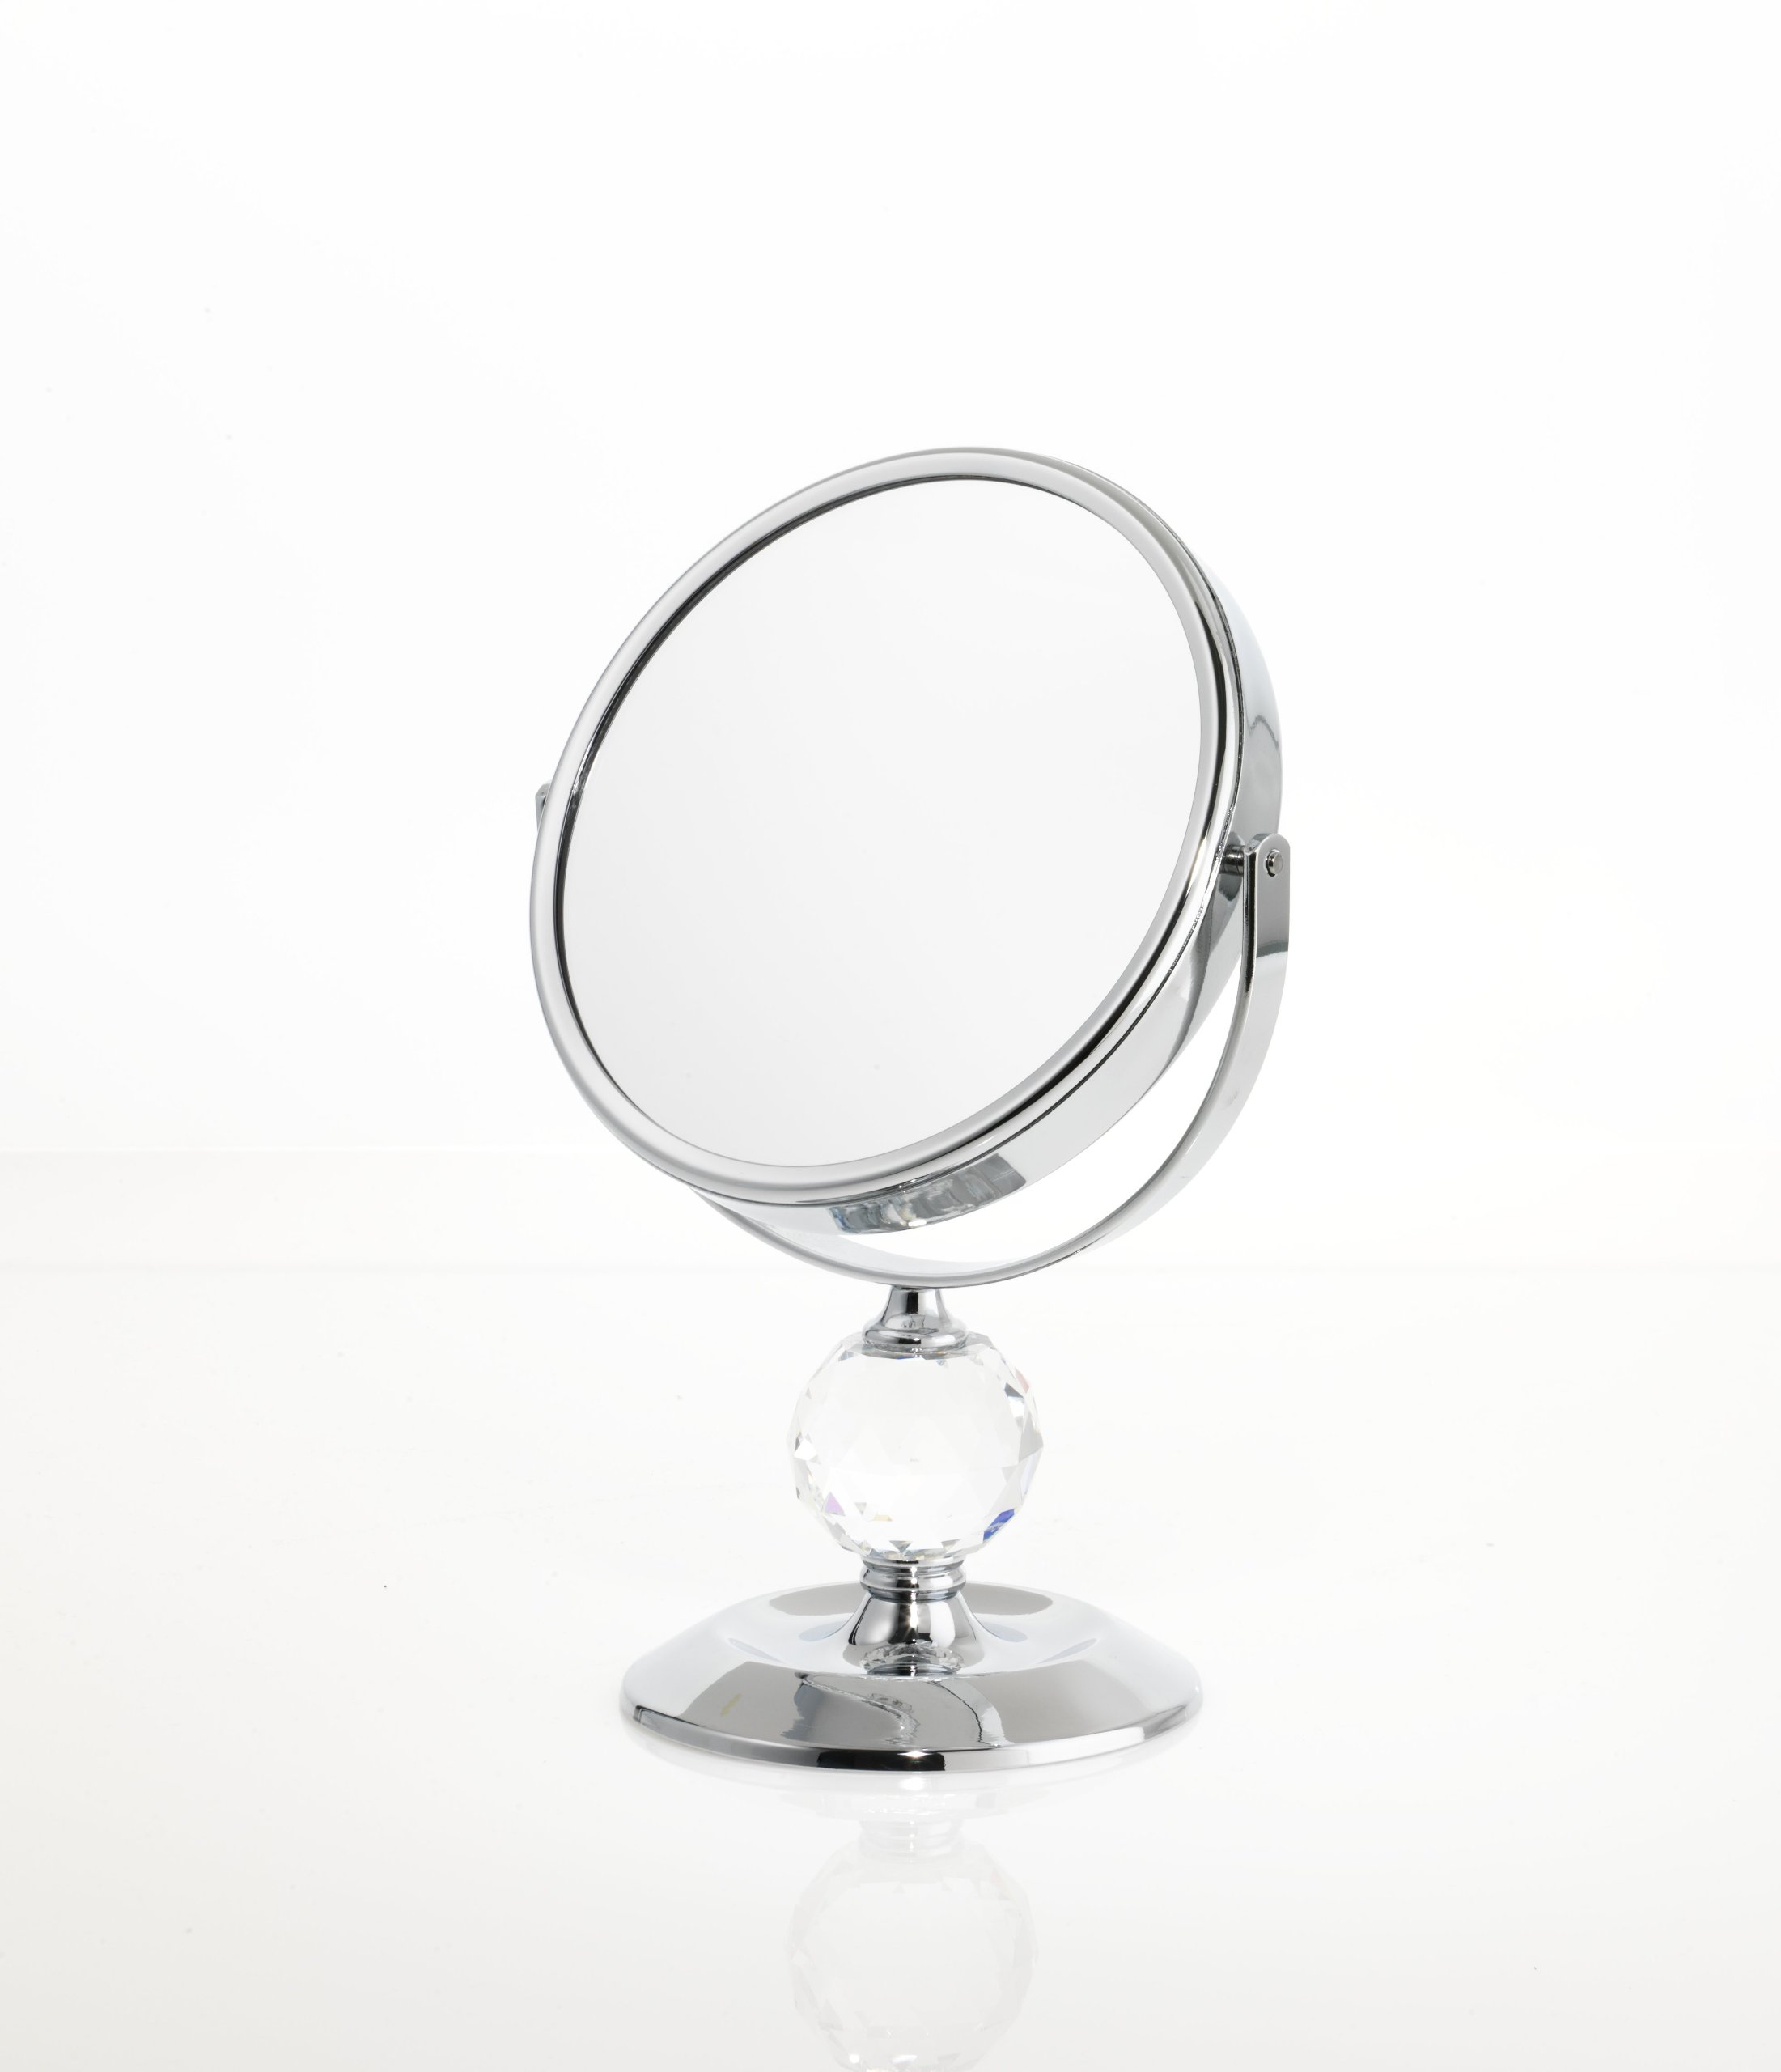 Danielle Single Crystal Ball 7x Magnification Mini Vanity Mirror